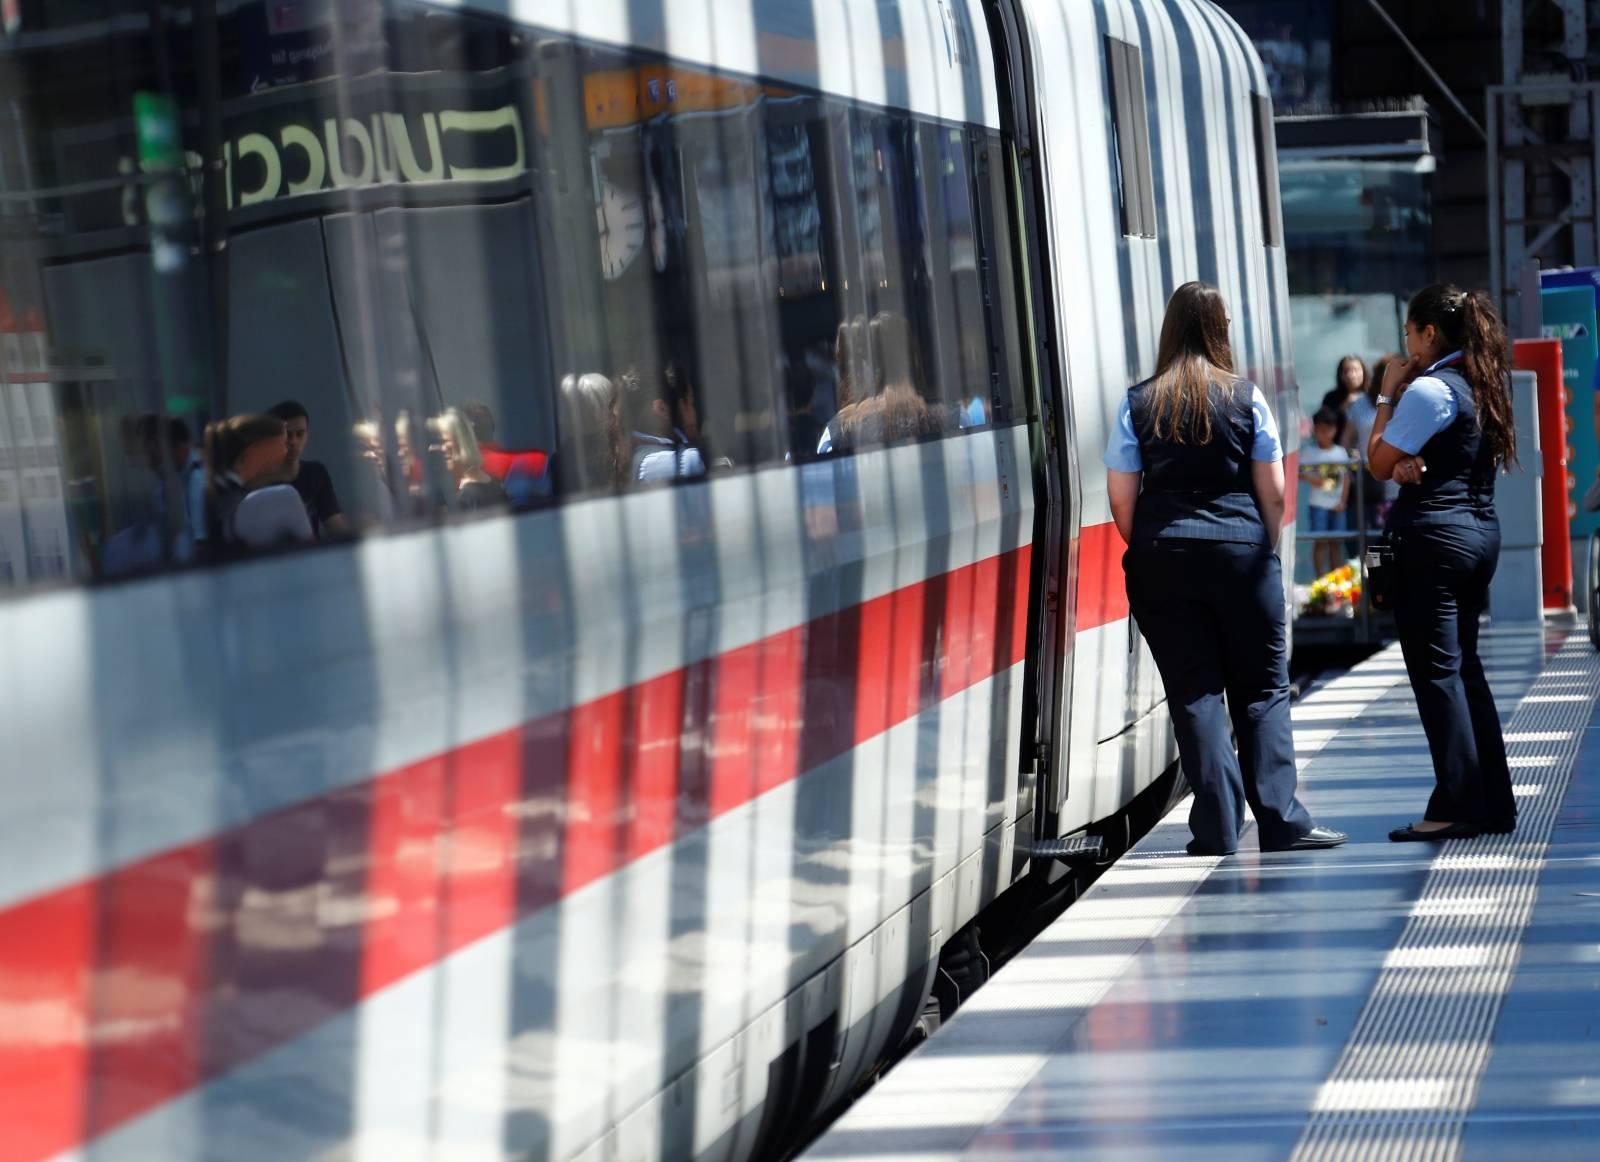 Deutsche Bahn employees stand next to an ICE high-speed train at the main train station in Frankfurt